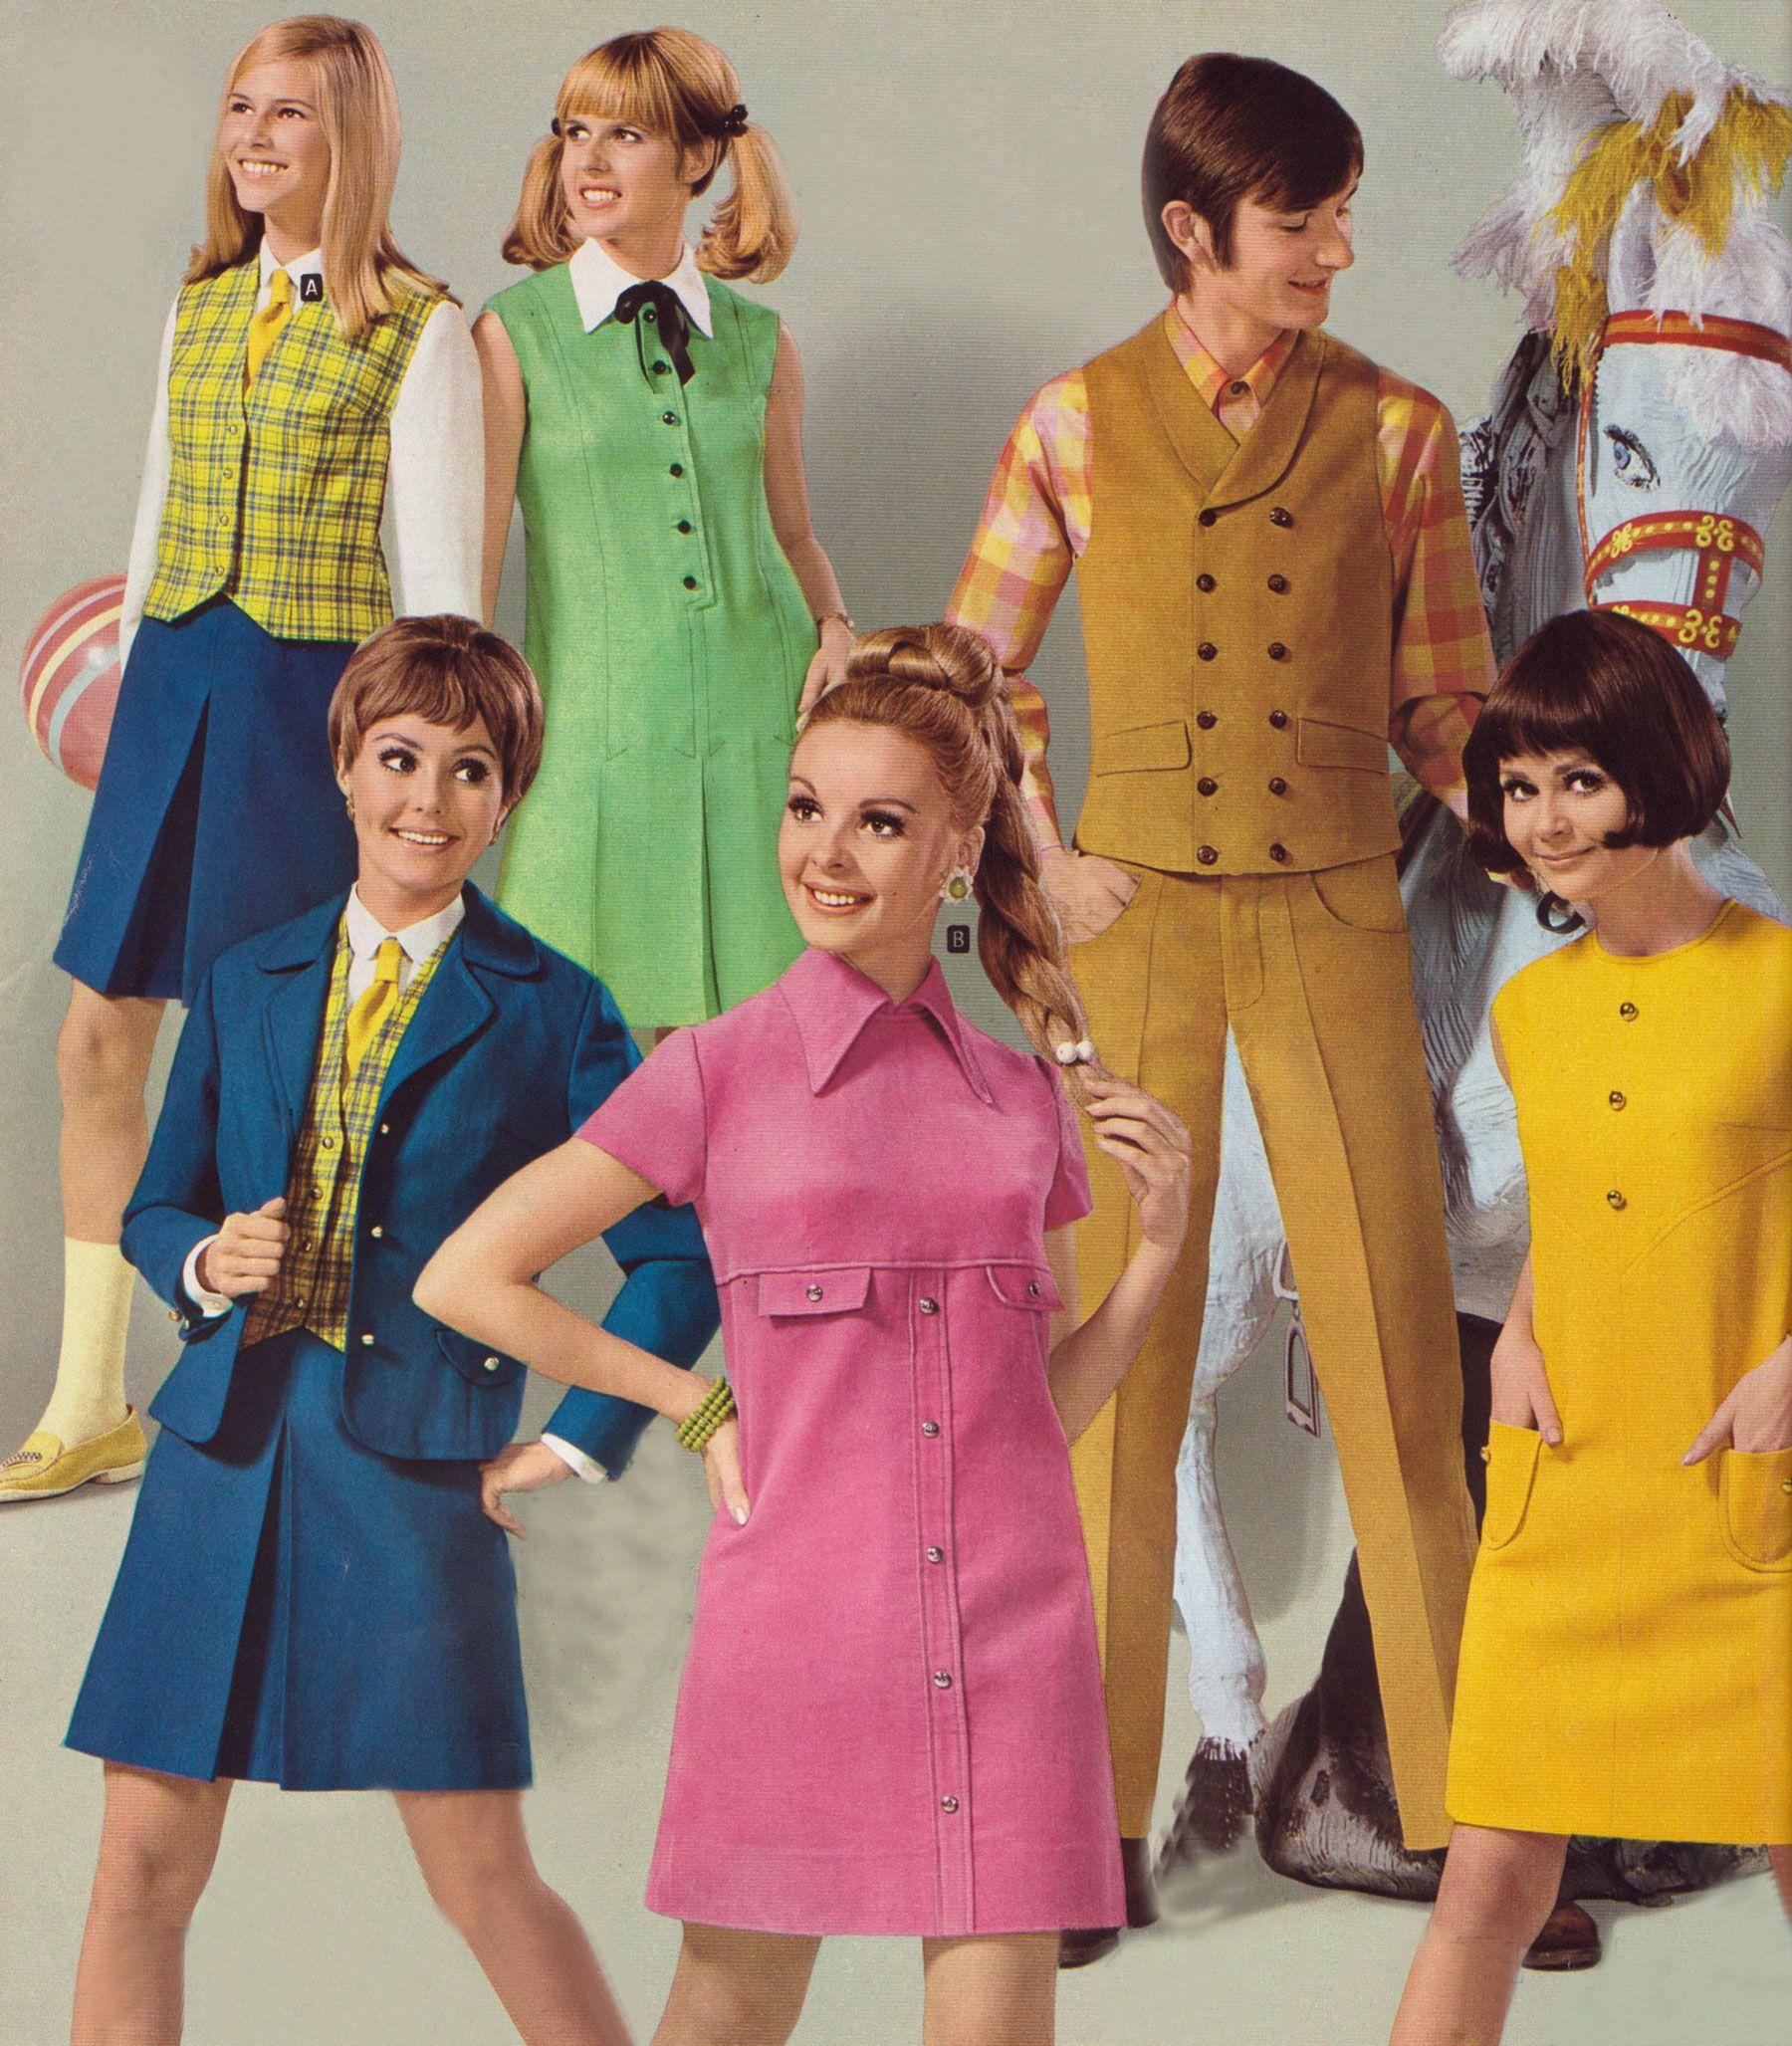 1967 1968 20th century women 39 s apparel pinterest ann es 60 annee et mode 1960. Black Bedroom Furniture Sets. Home Design Ideas